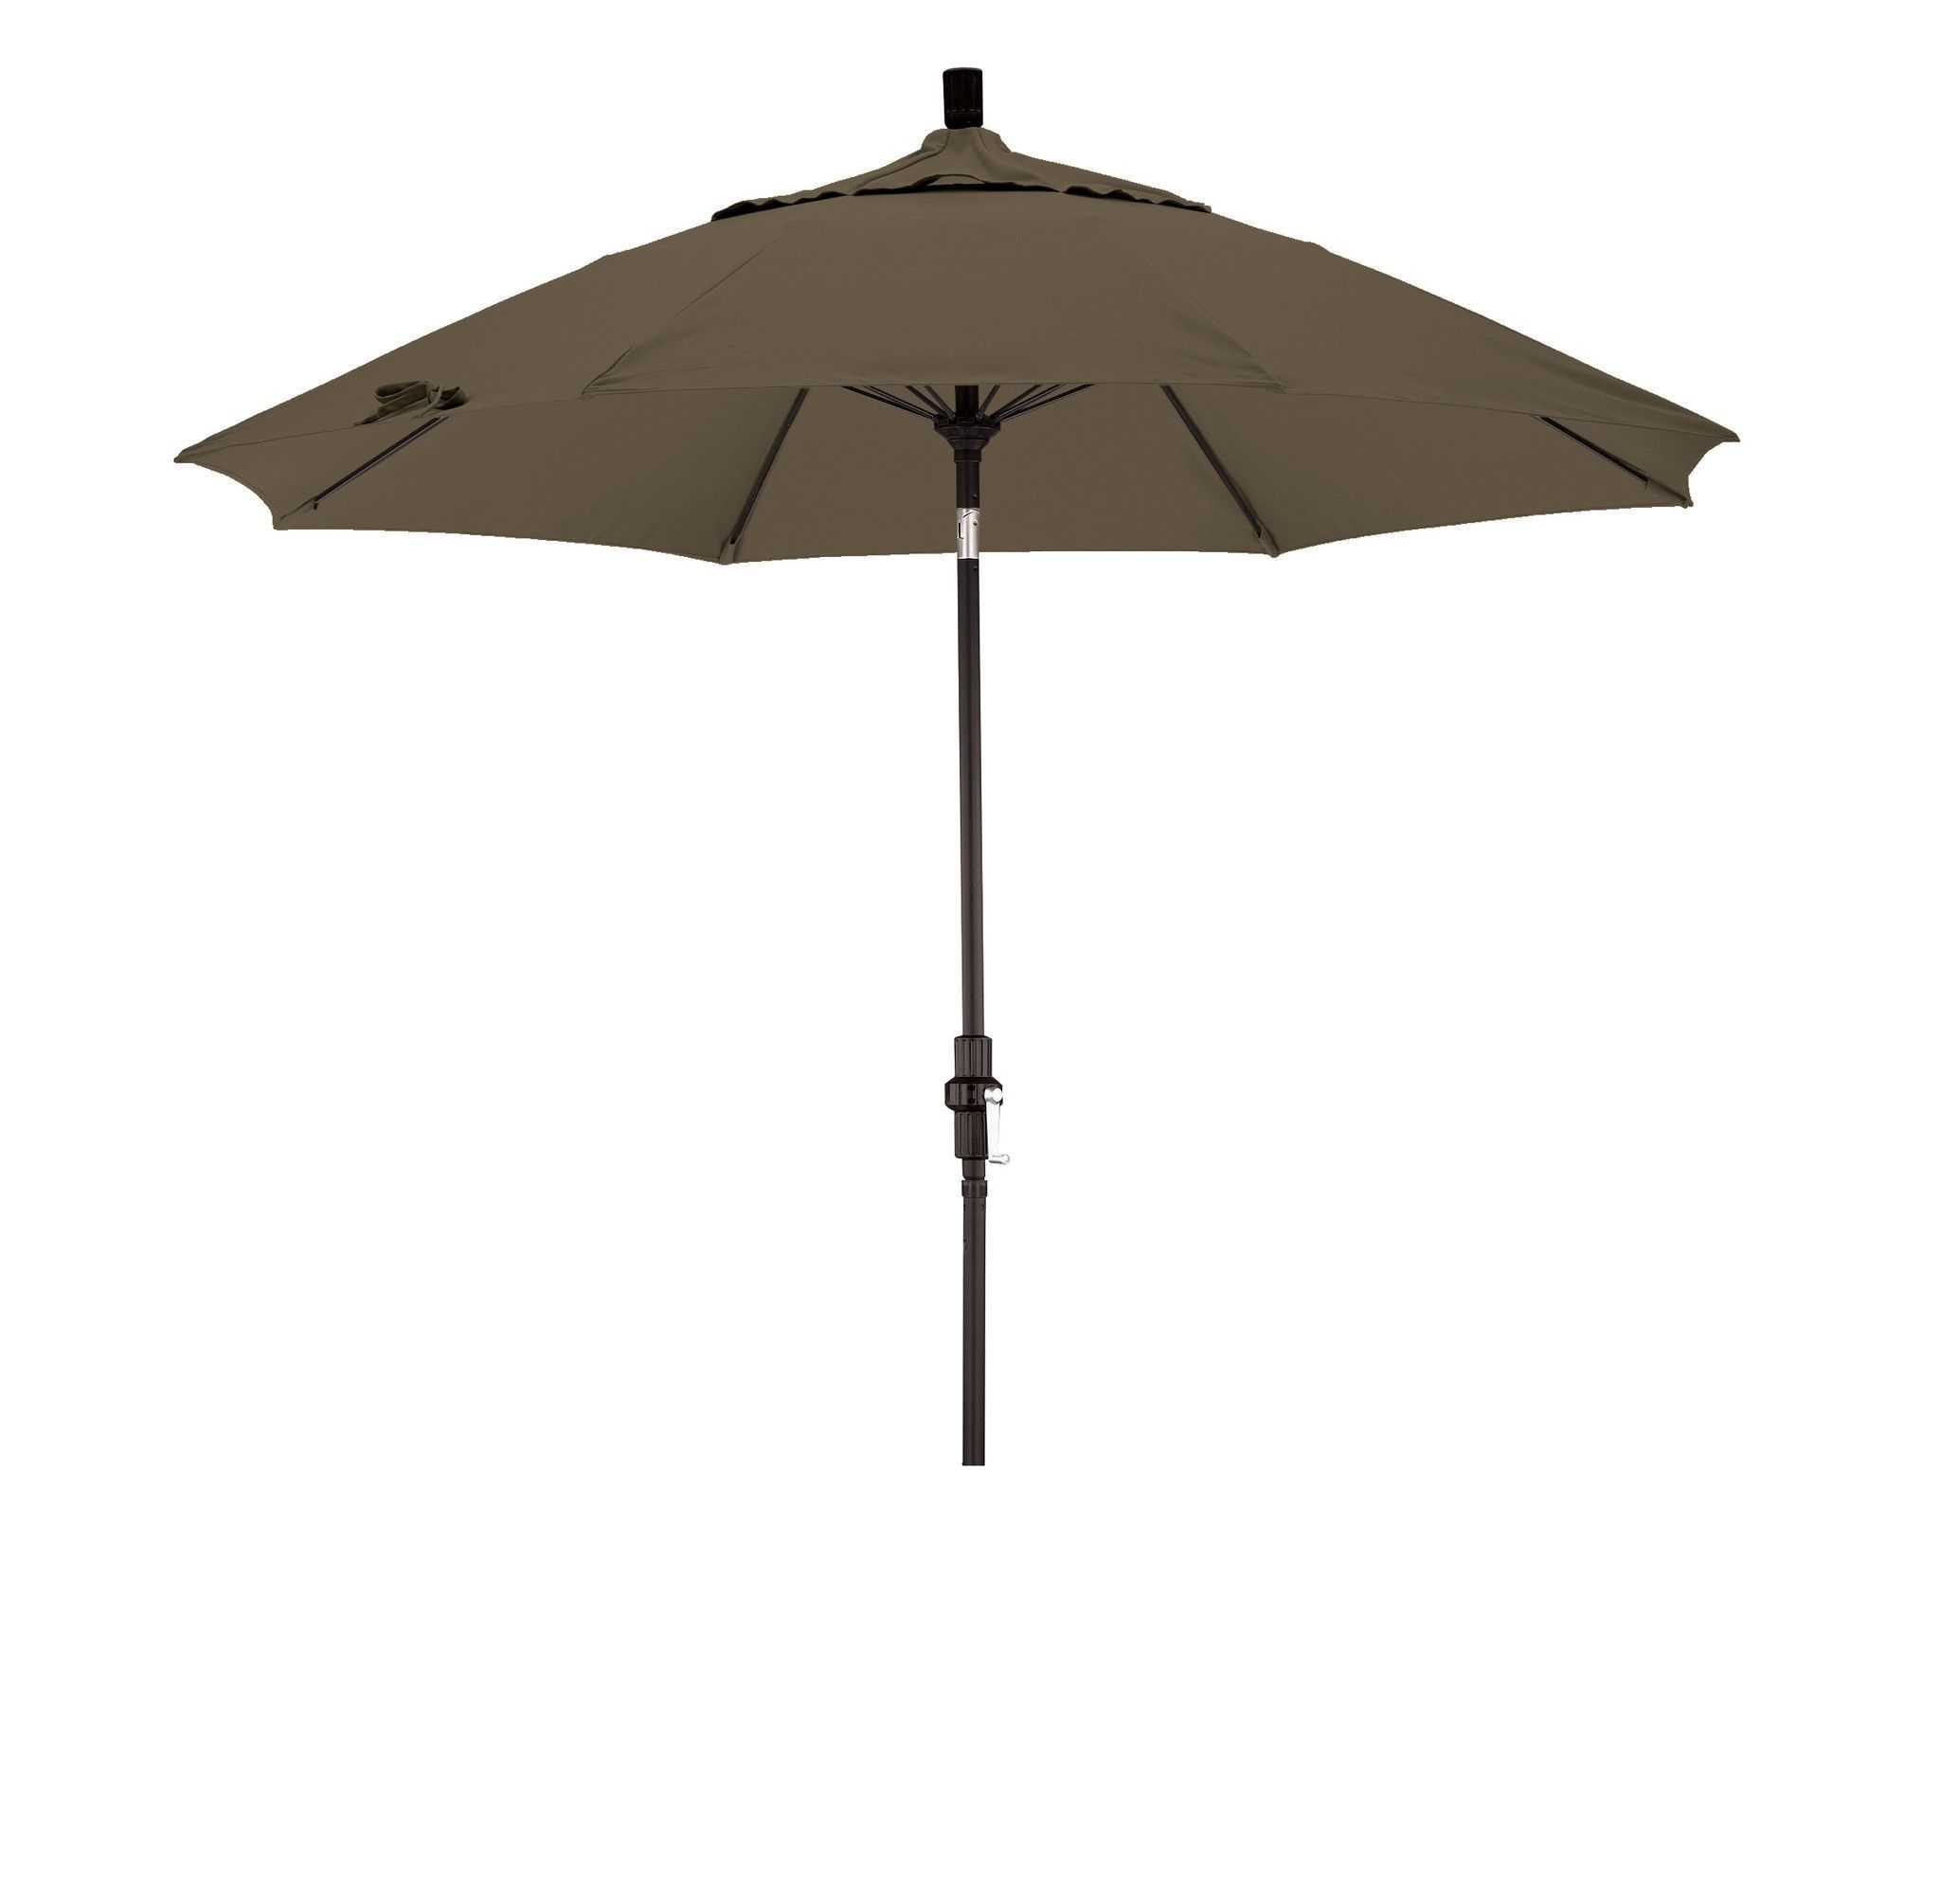 Favorite Eclipse Collection 9' Fiberglass Market Umbrella Collar Tilt M Black Regarding Sunbrella Teak Umbrellas (View 2 of 20)